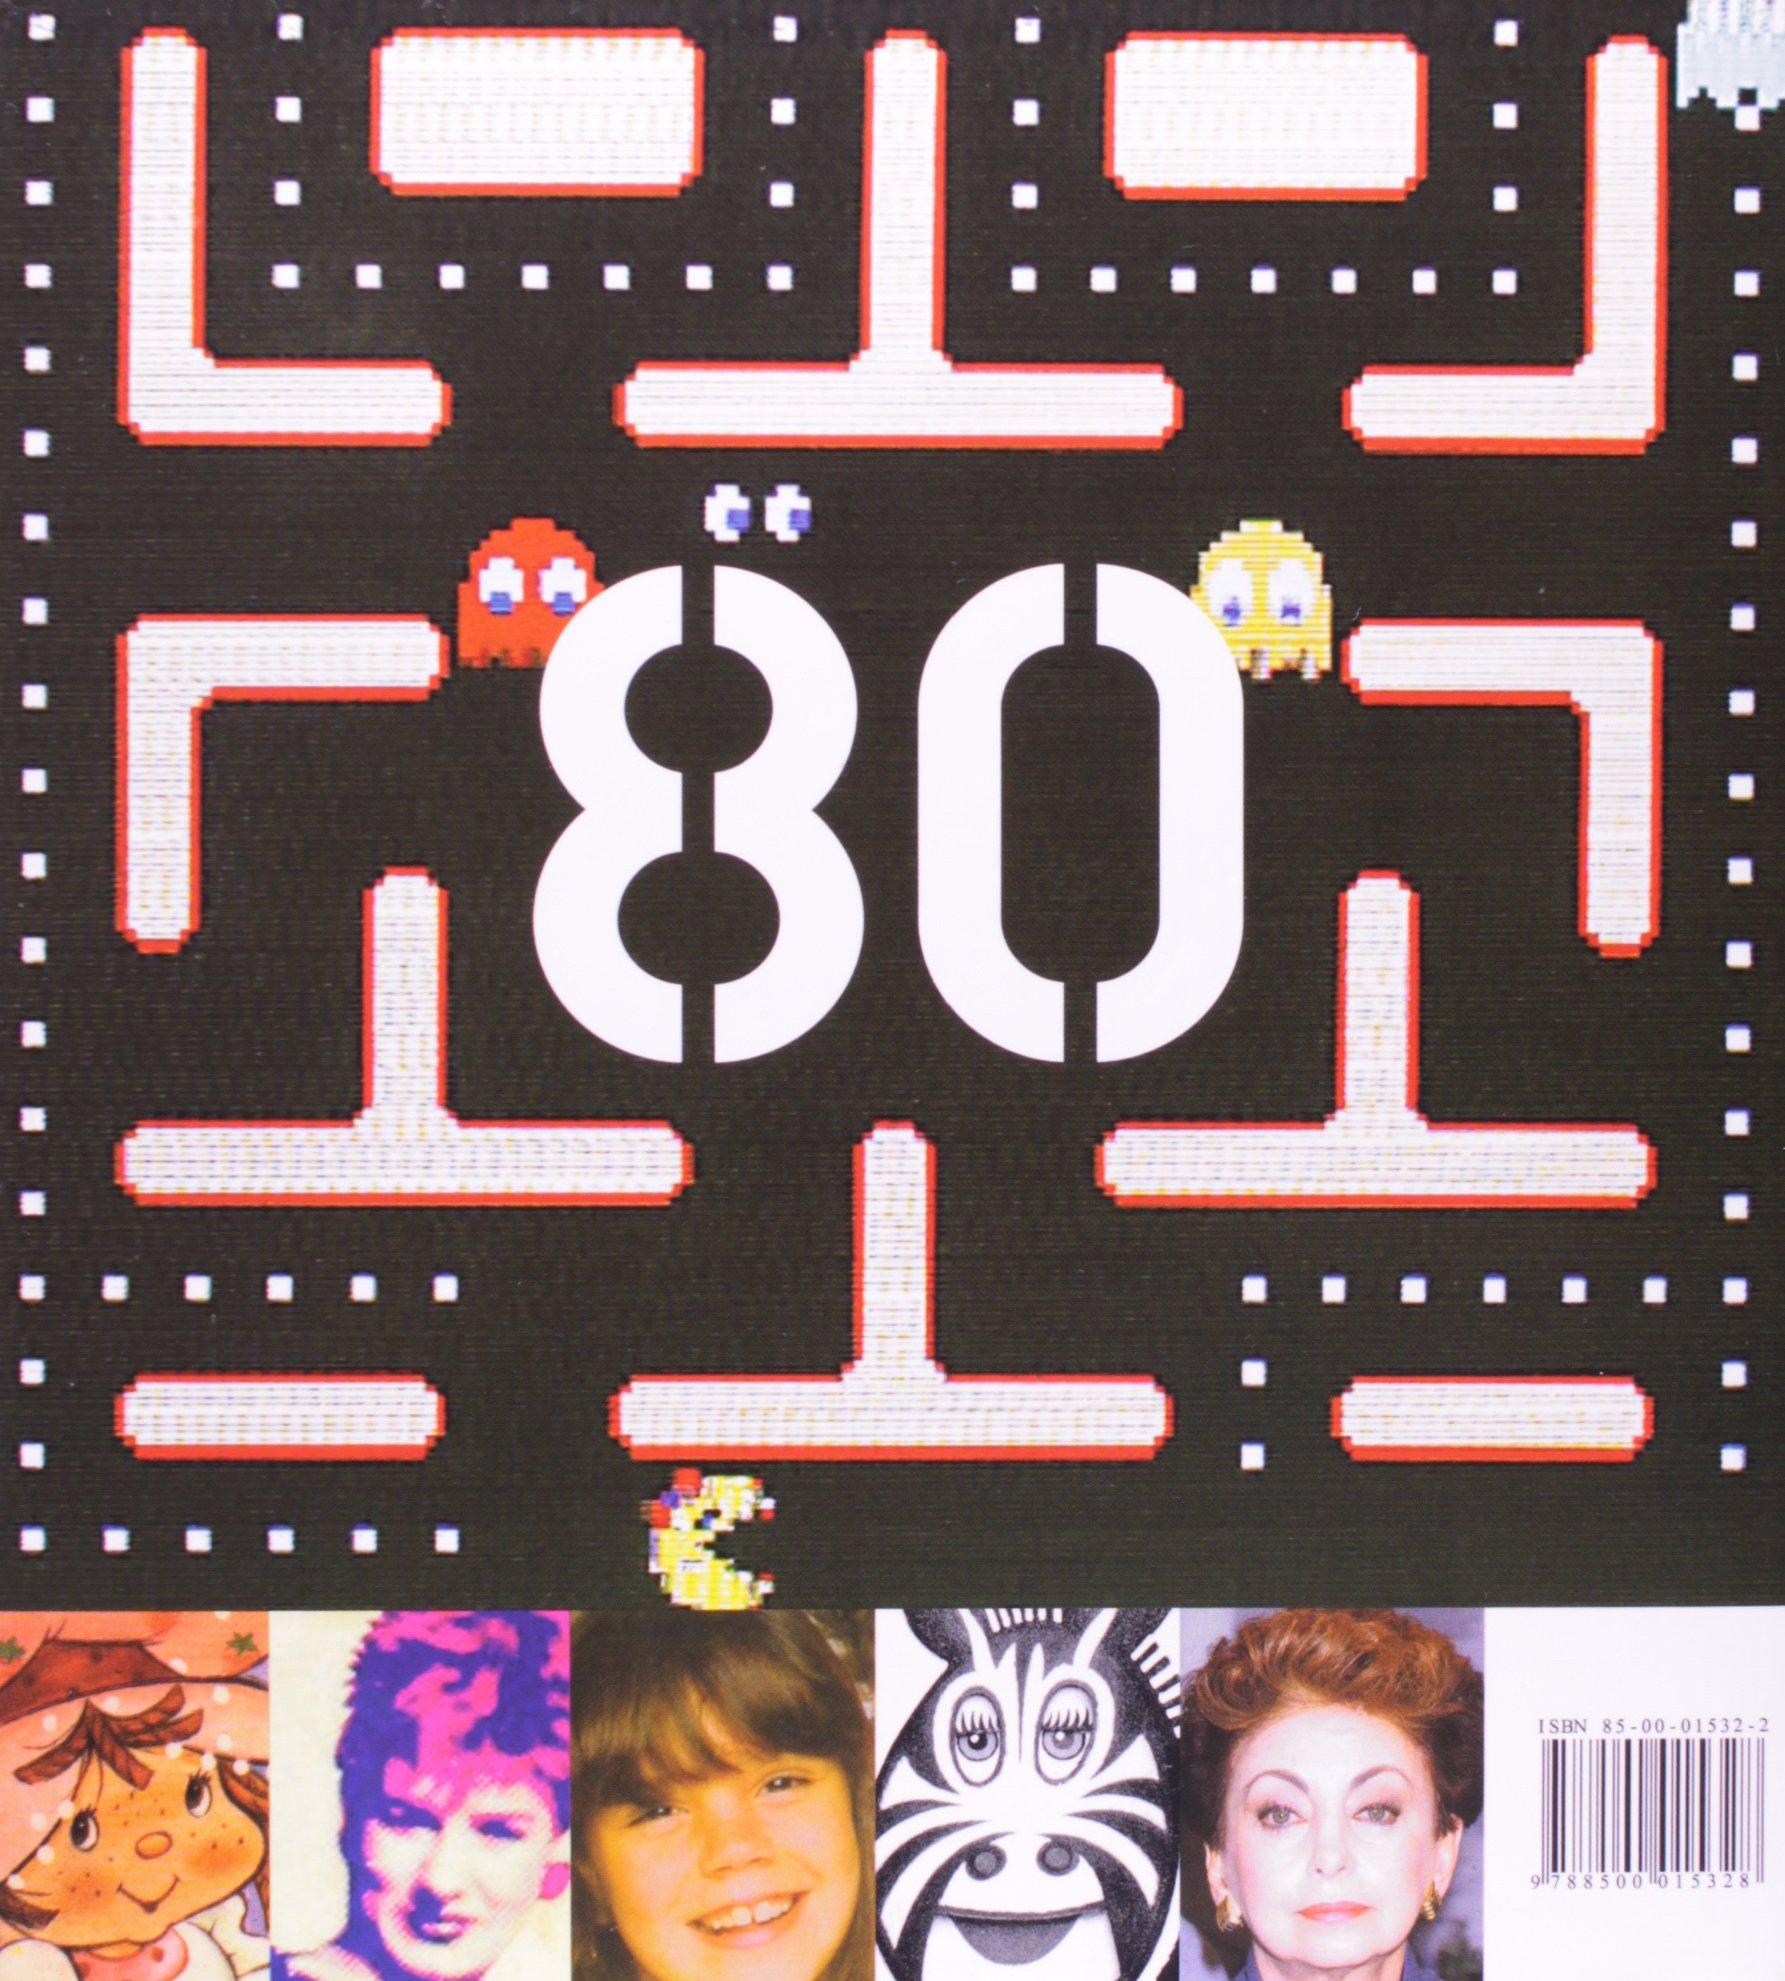 Almanaque anos 80 em portugues do brasil luiz andre alzer almanaque anos 80 em portugues do brasil luiz andre alzer mariana claudino 9788500015328 amazon books fandeluxe Gallery